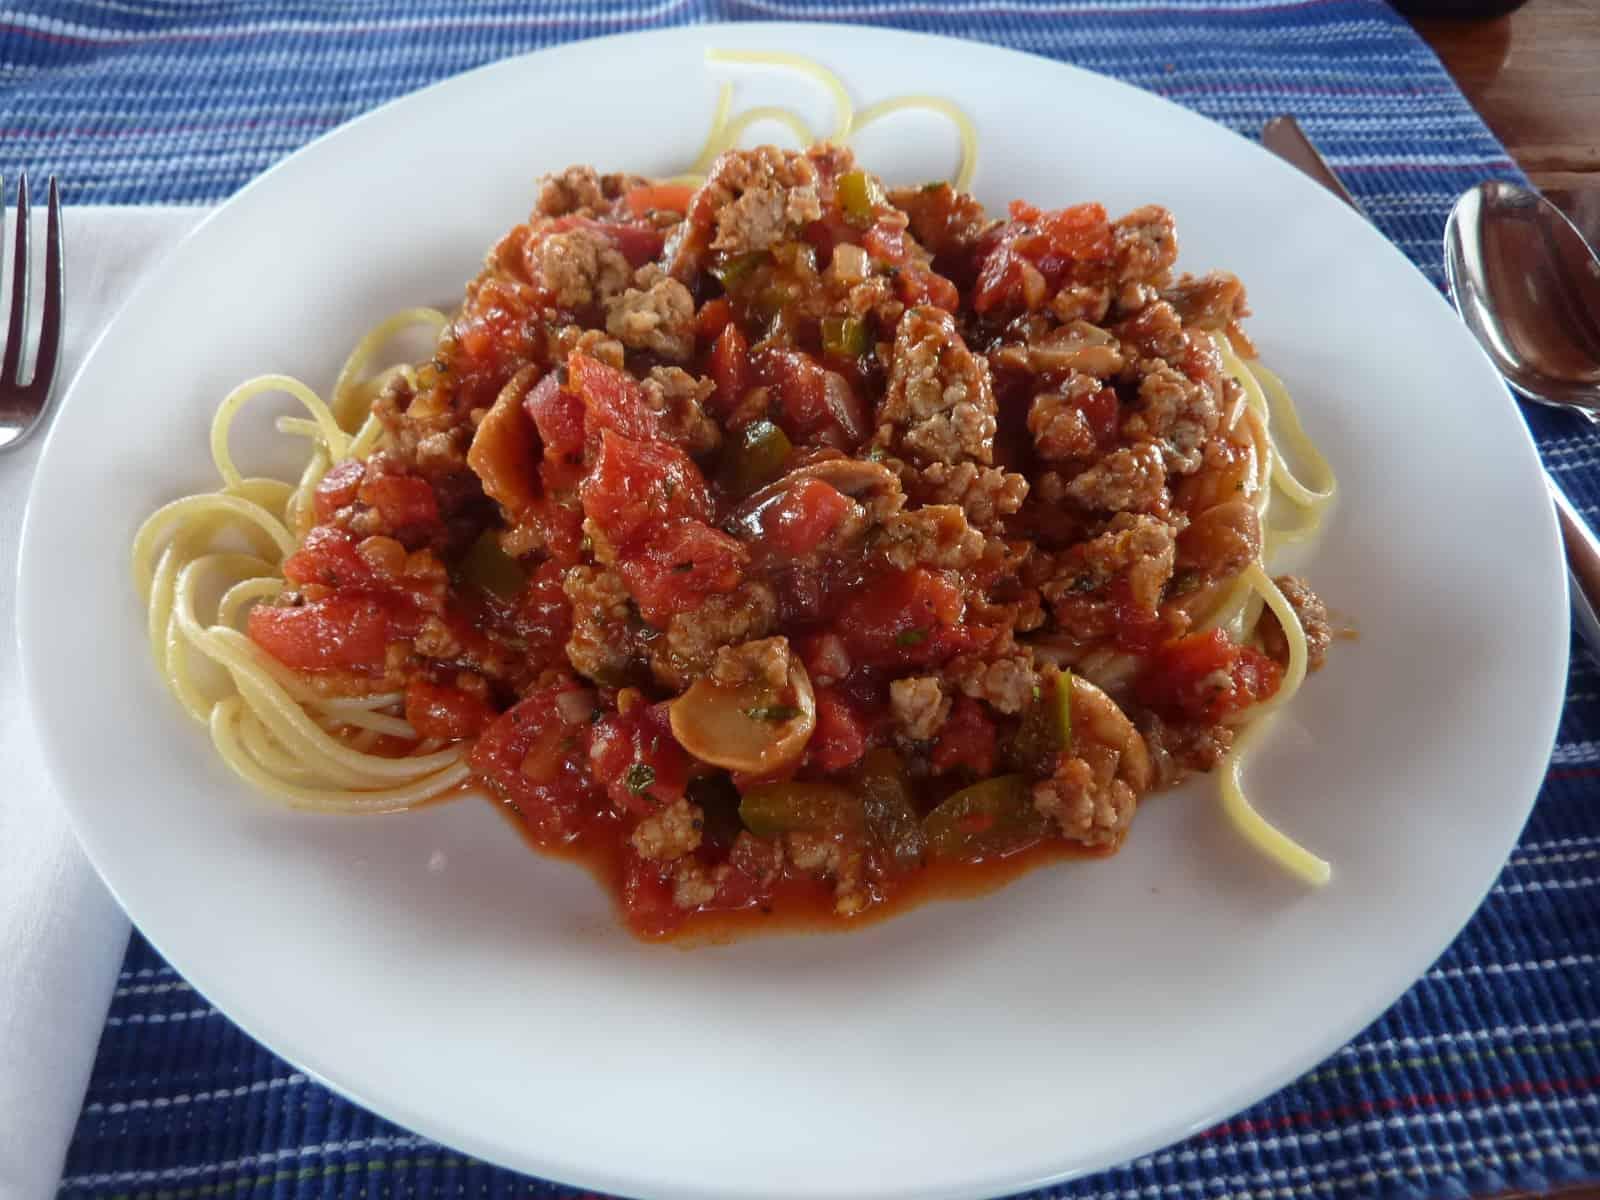 Plate of spaghetti with marinara sauce and sausage.